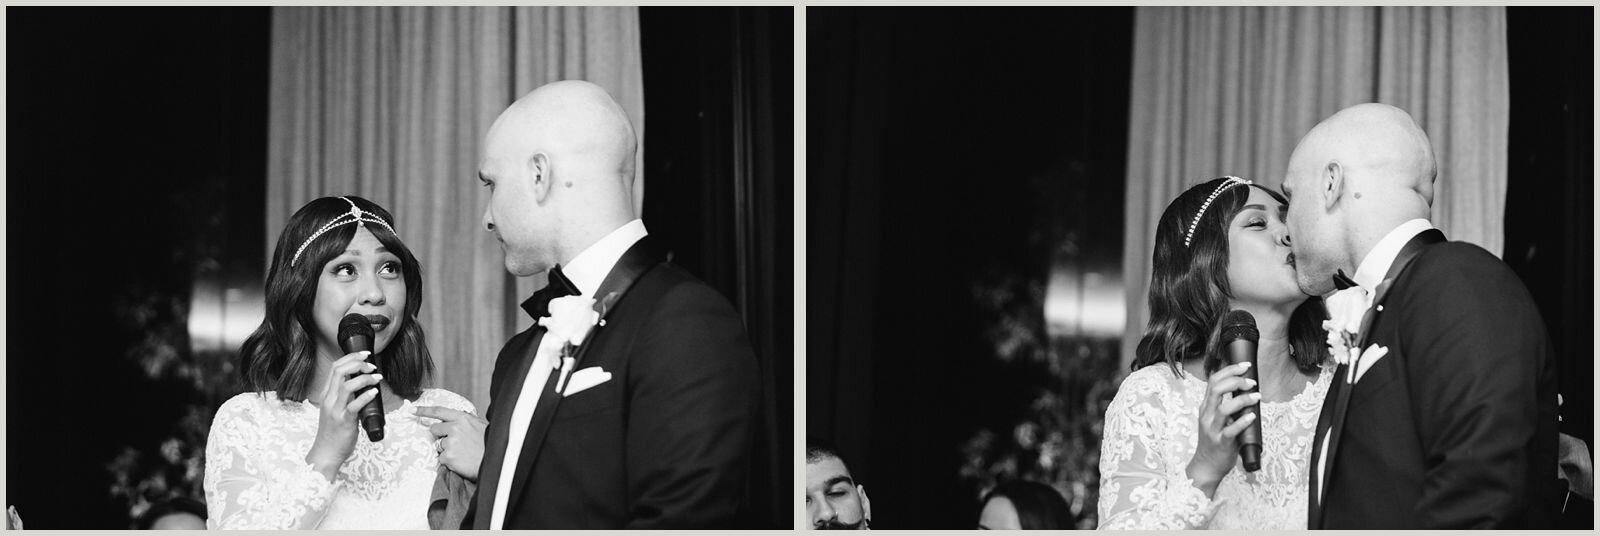 joseph_koprek_wedding_melbourne_the_prince_deck_0093.jpg